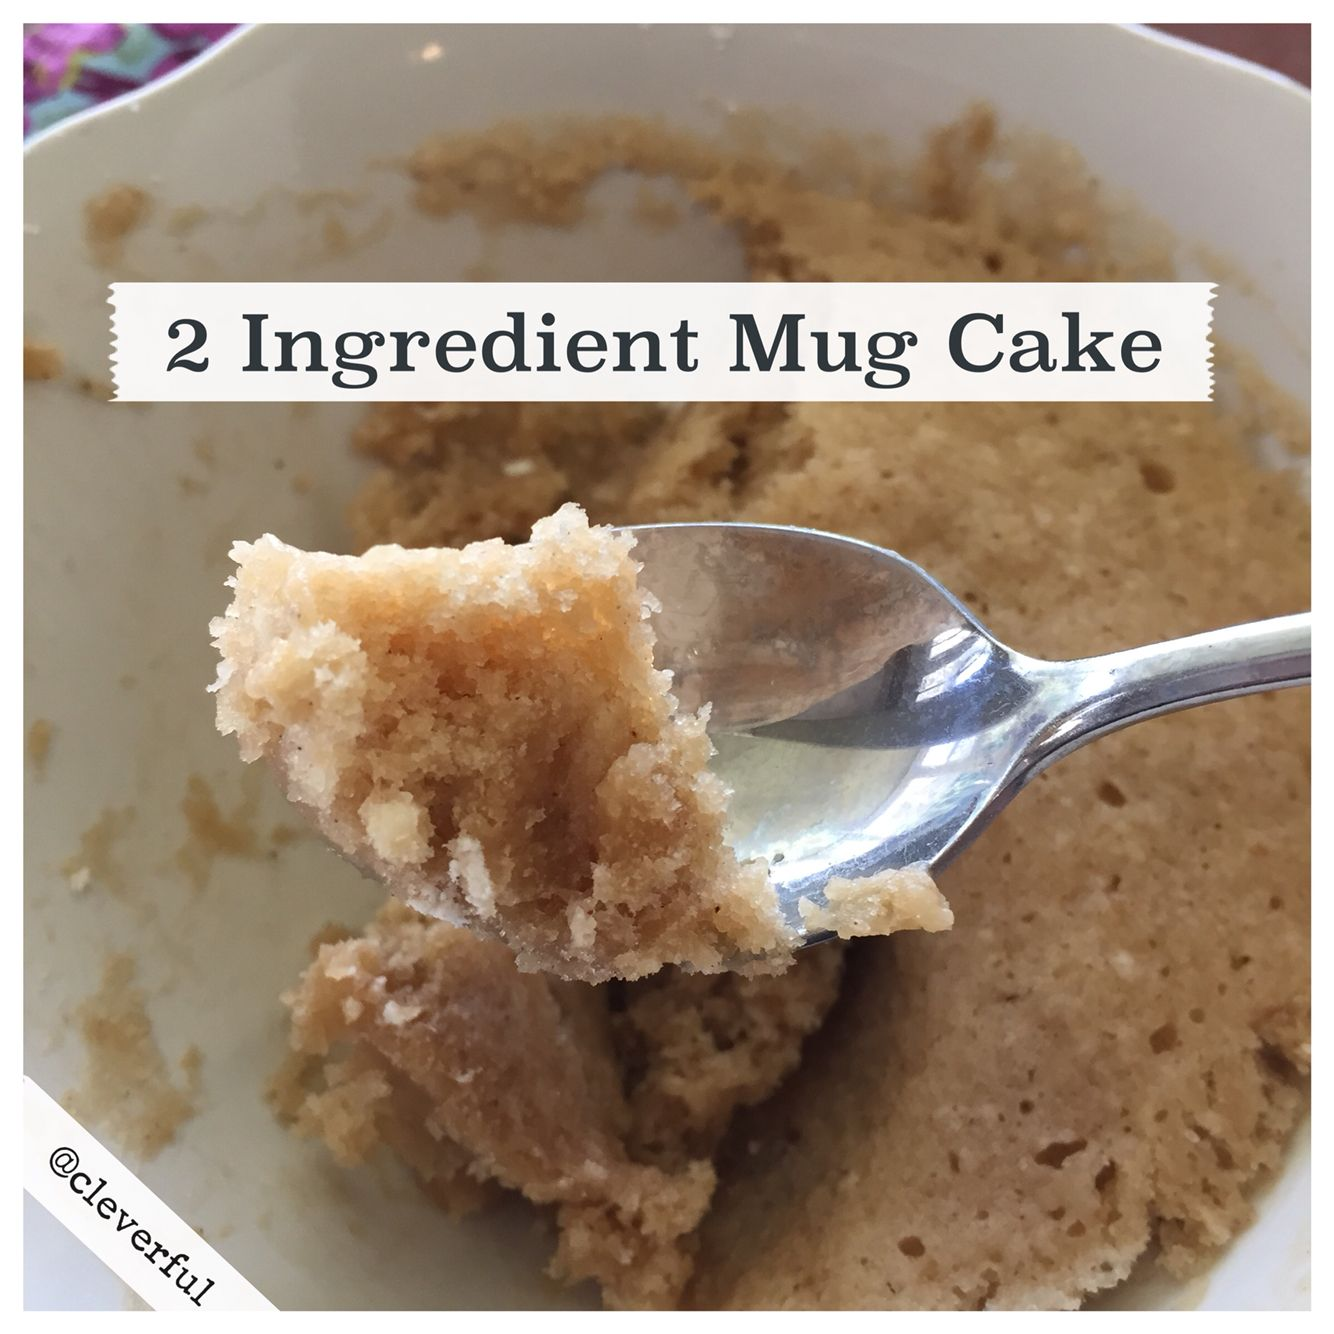 Bisquick And Applesauce Mug Cake 3 Tablespoons Bisquick